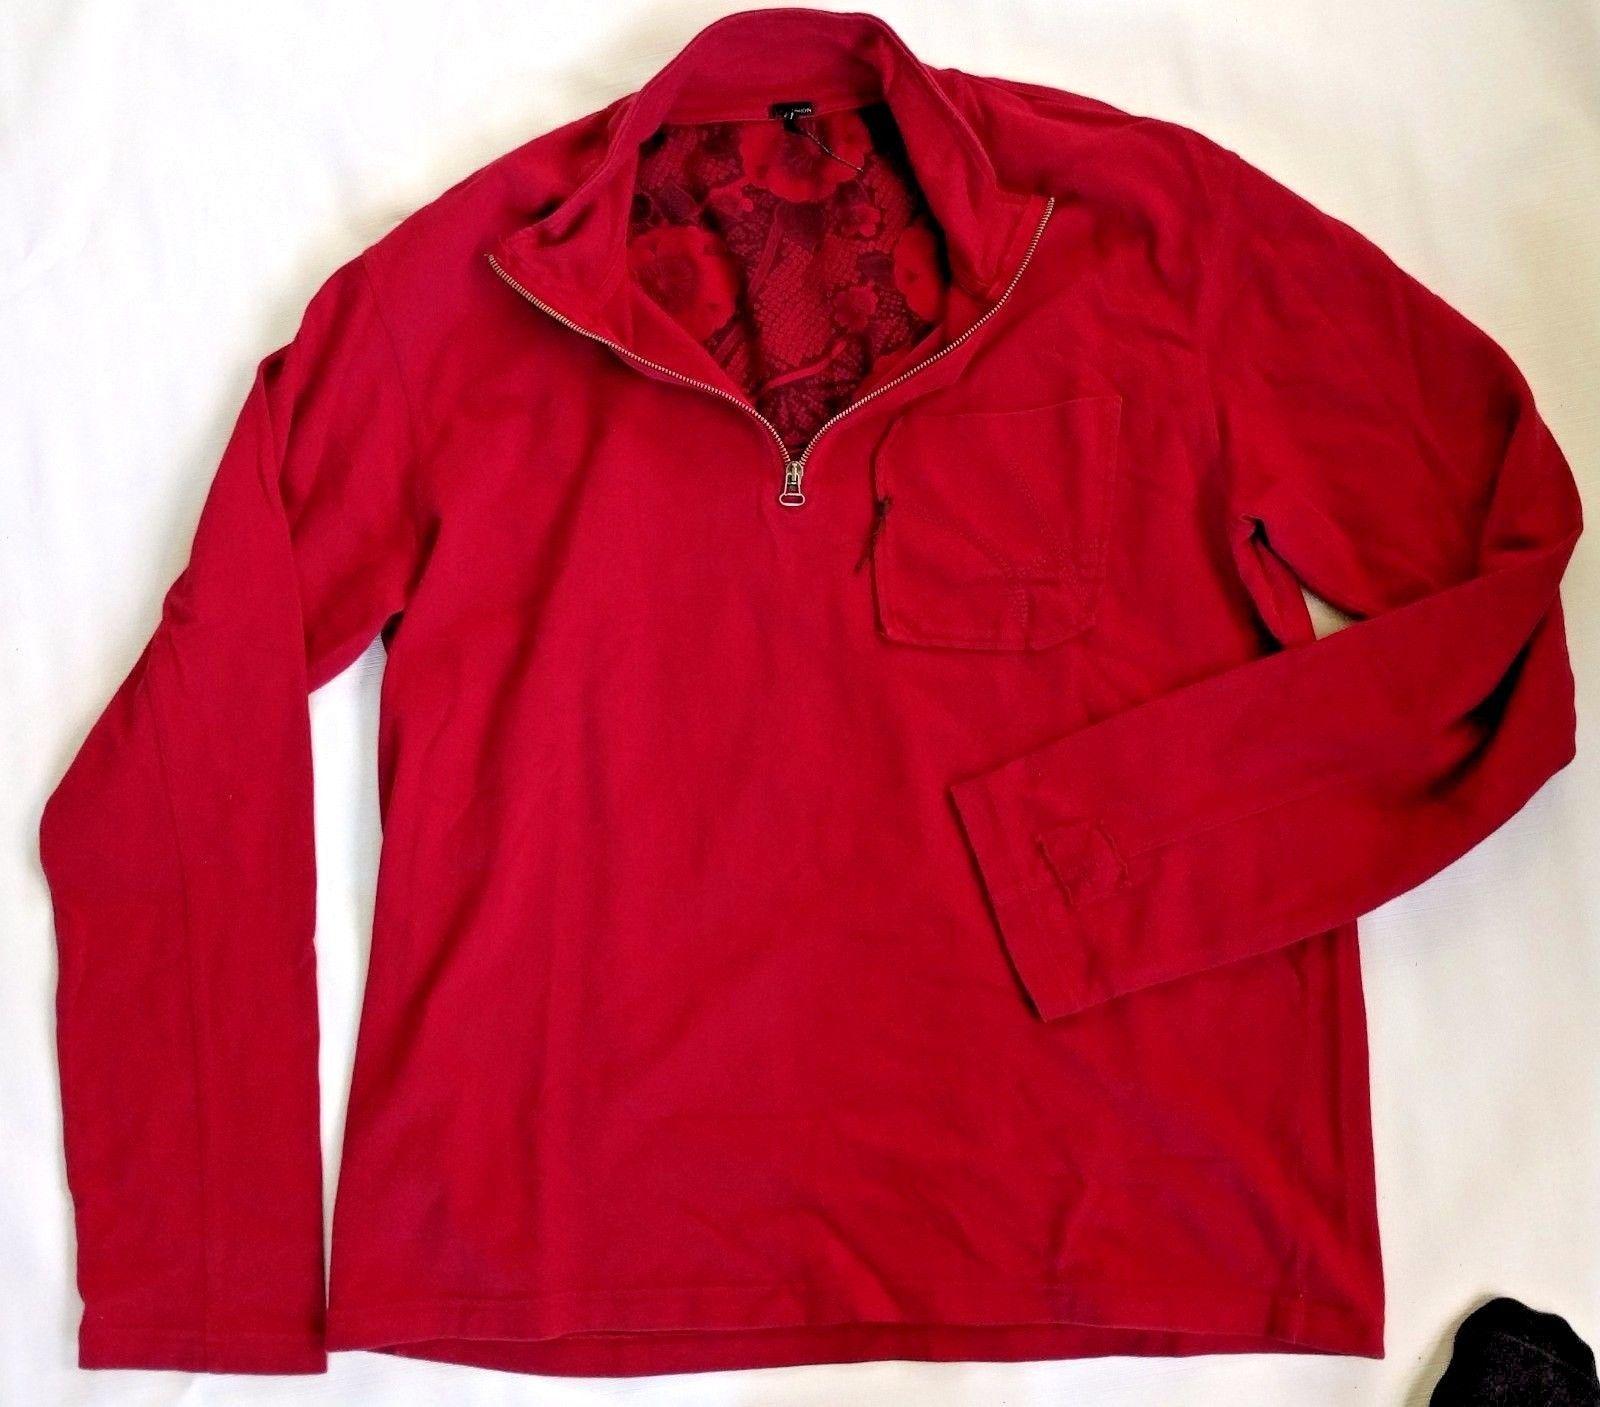 UNION LOS ANGELES Boutique USA Men XL Burgundy Half Zip Cotton Sweatshirt Jacket